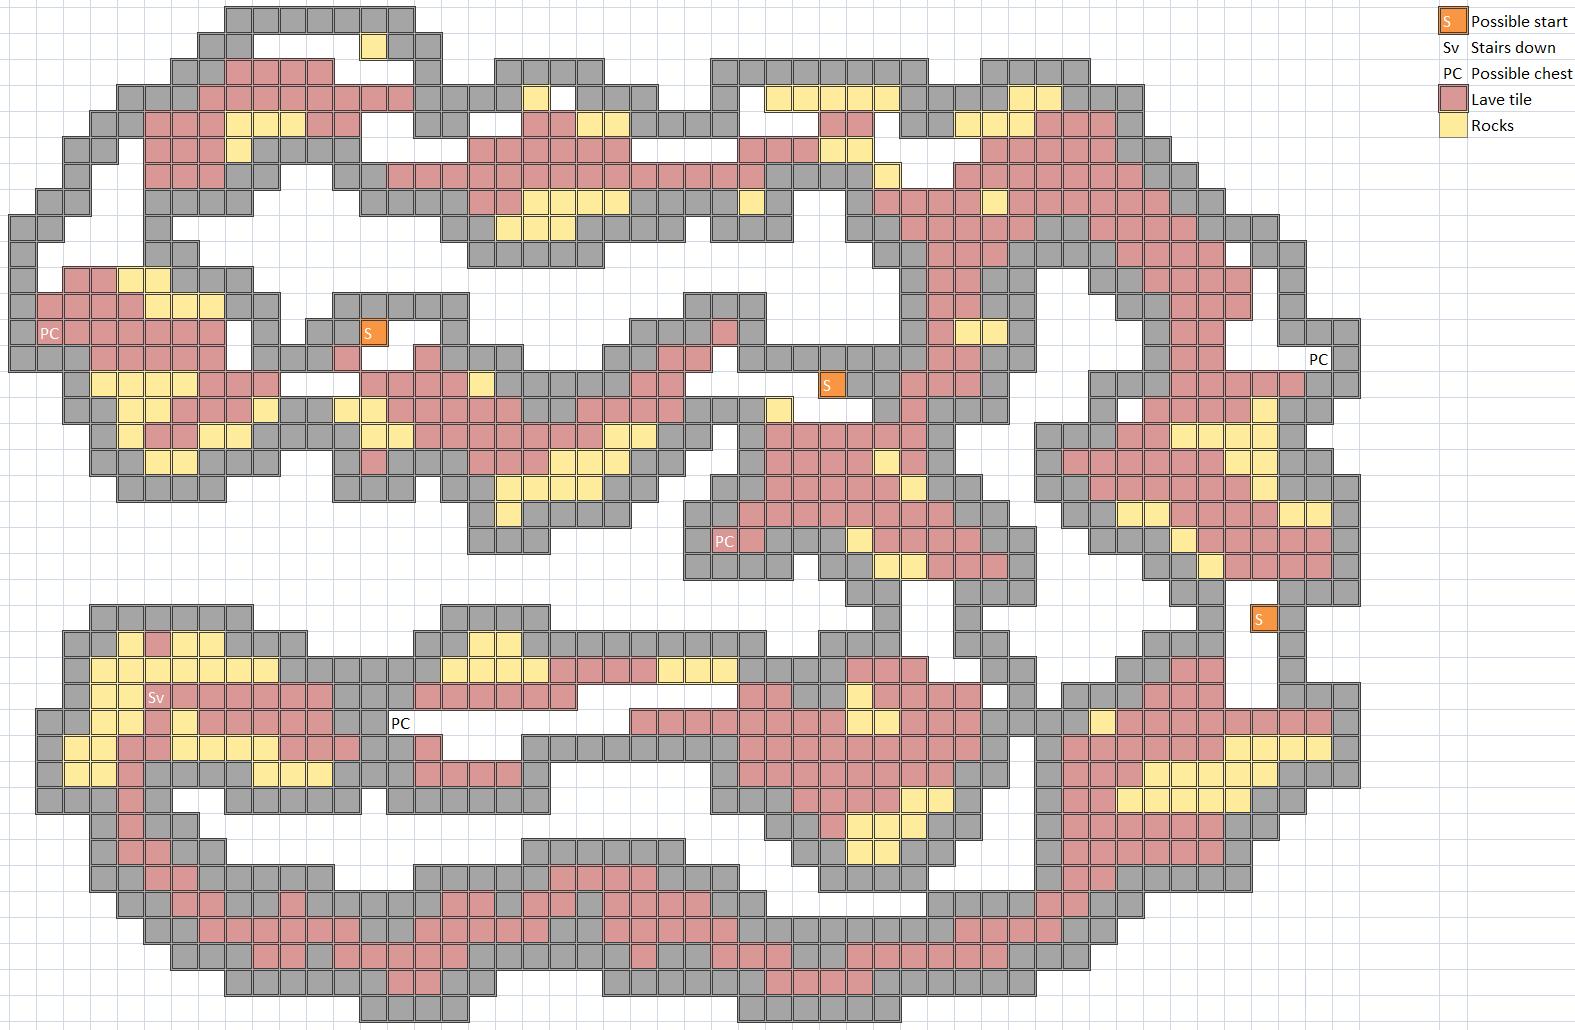 Spiral Lavaway Map